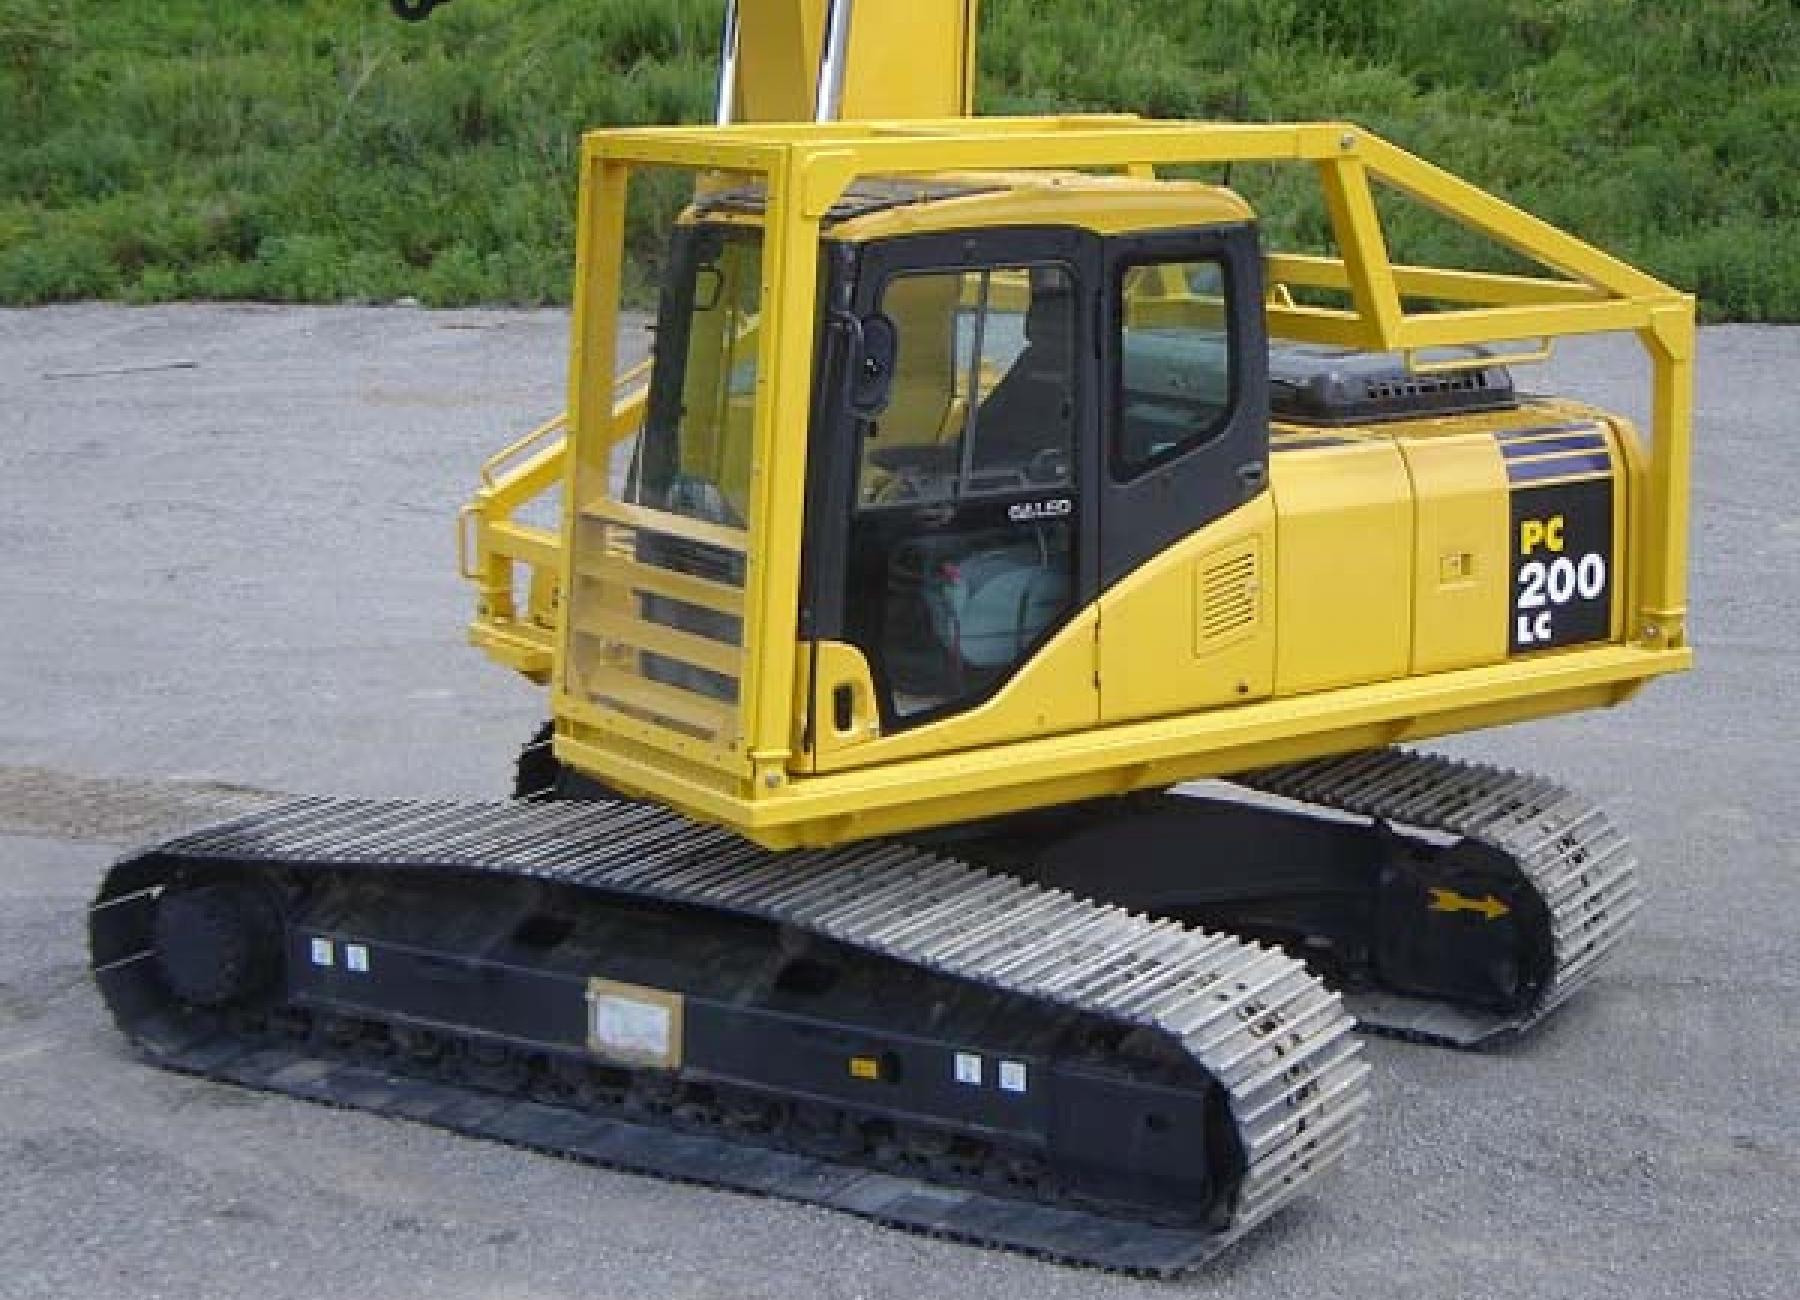 road builder guard excavator paladin attachments